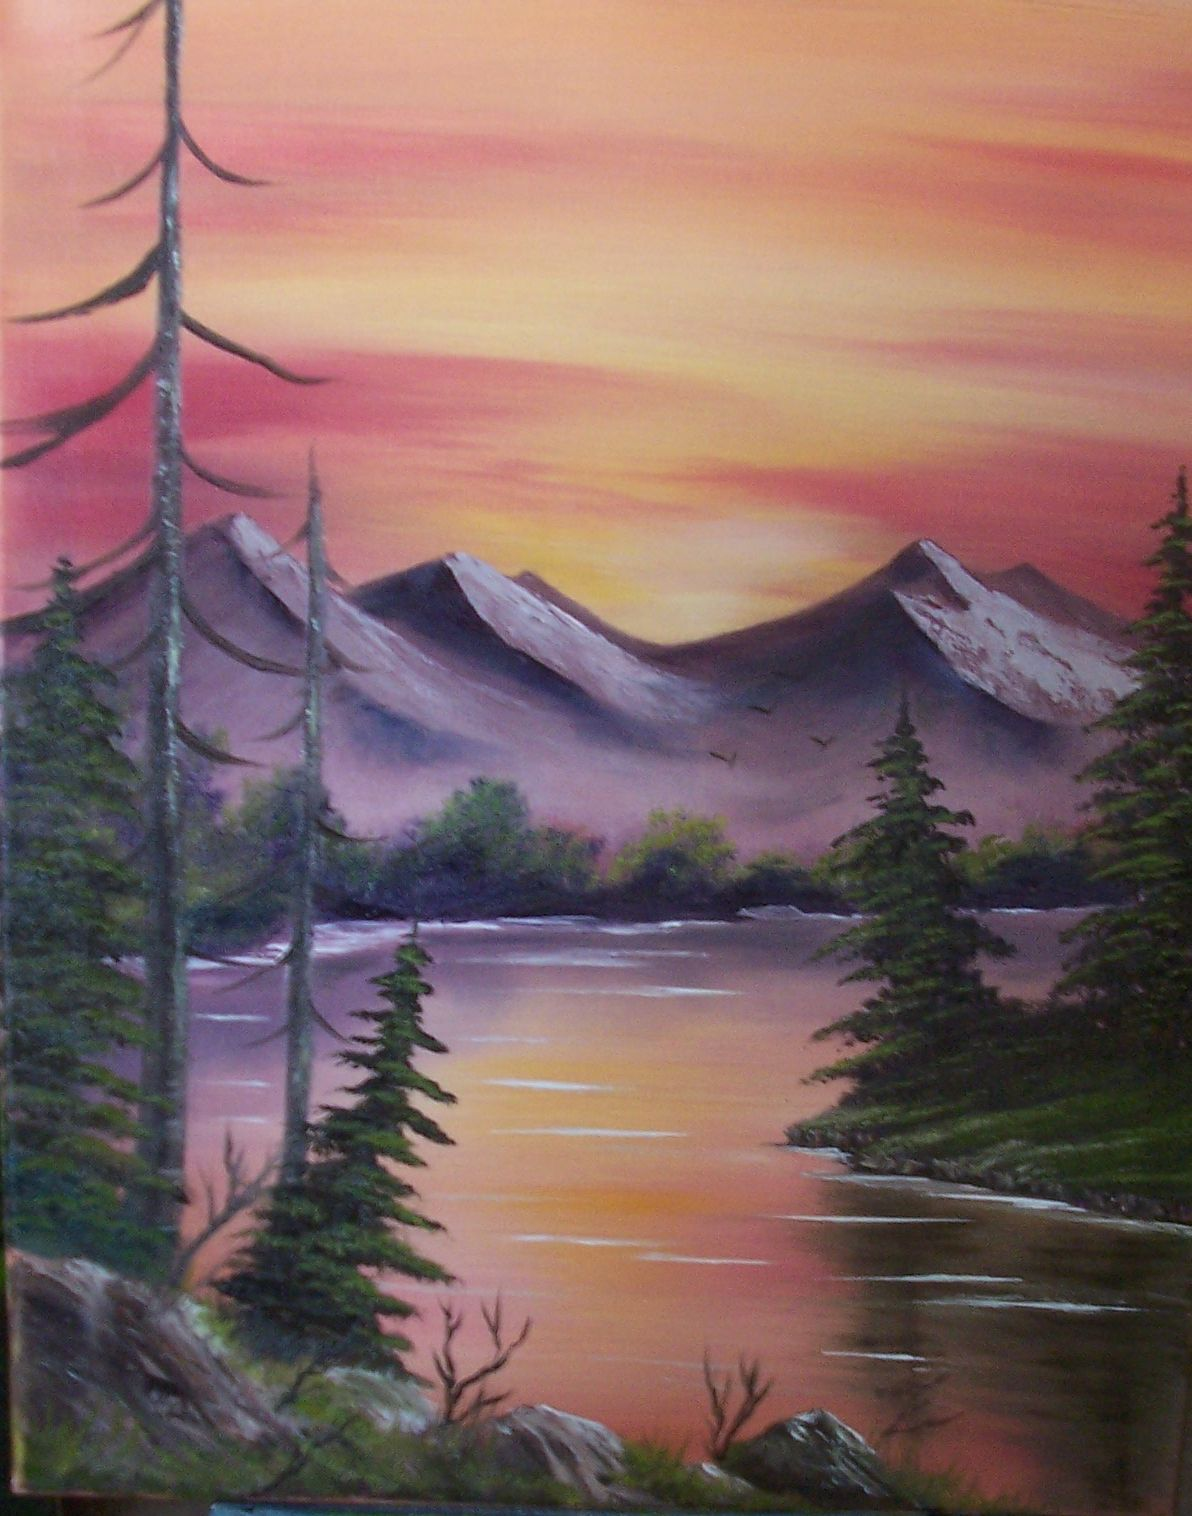 Sunset Mountain Paintings For Sale Classes Www Paintwithvicki Com Landscapedrawing Landscape Paintings Landscape Drawings Mountain Paintings